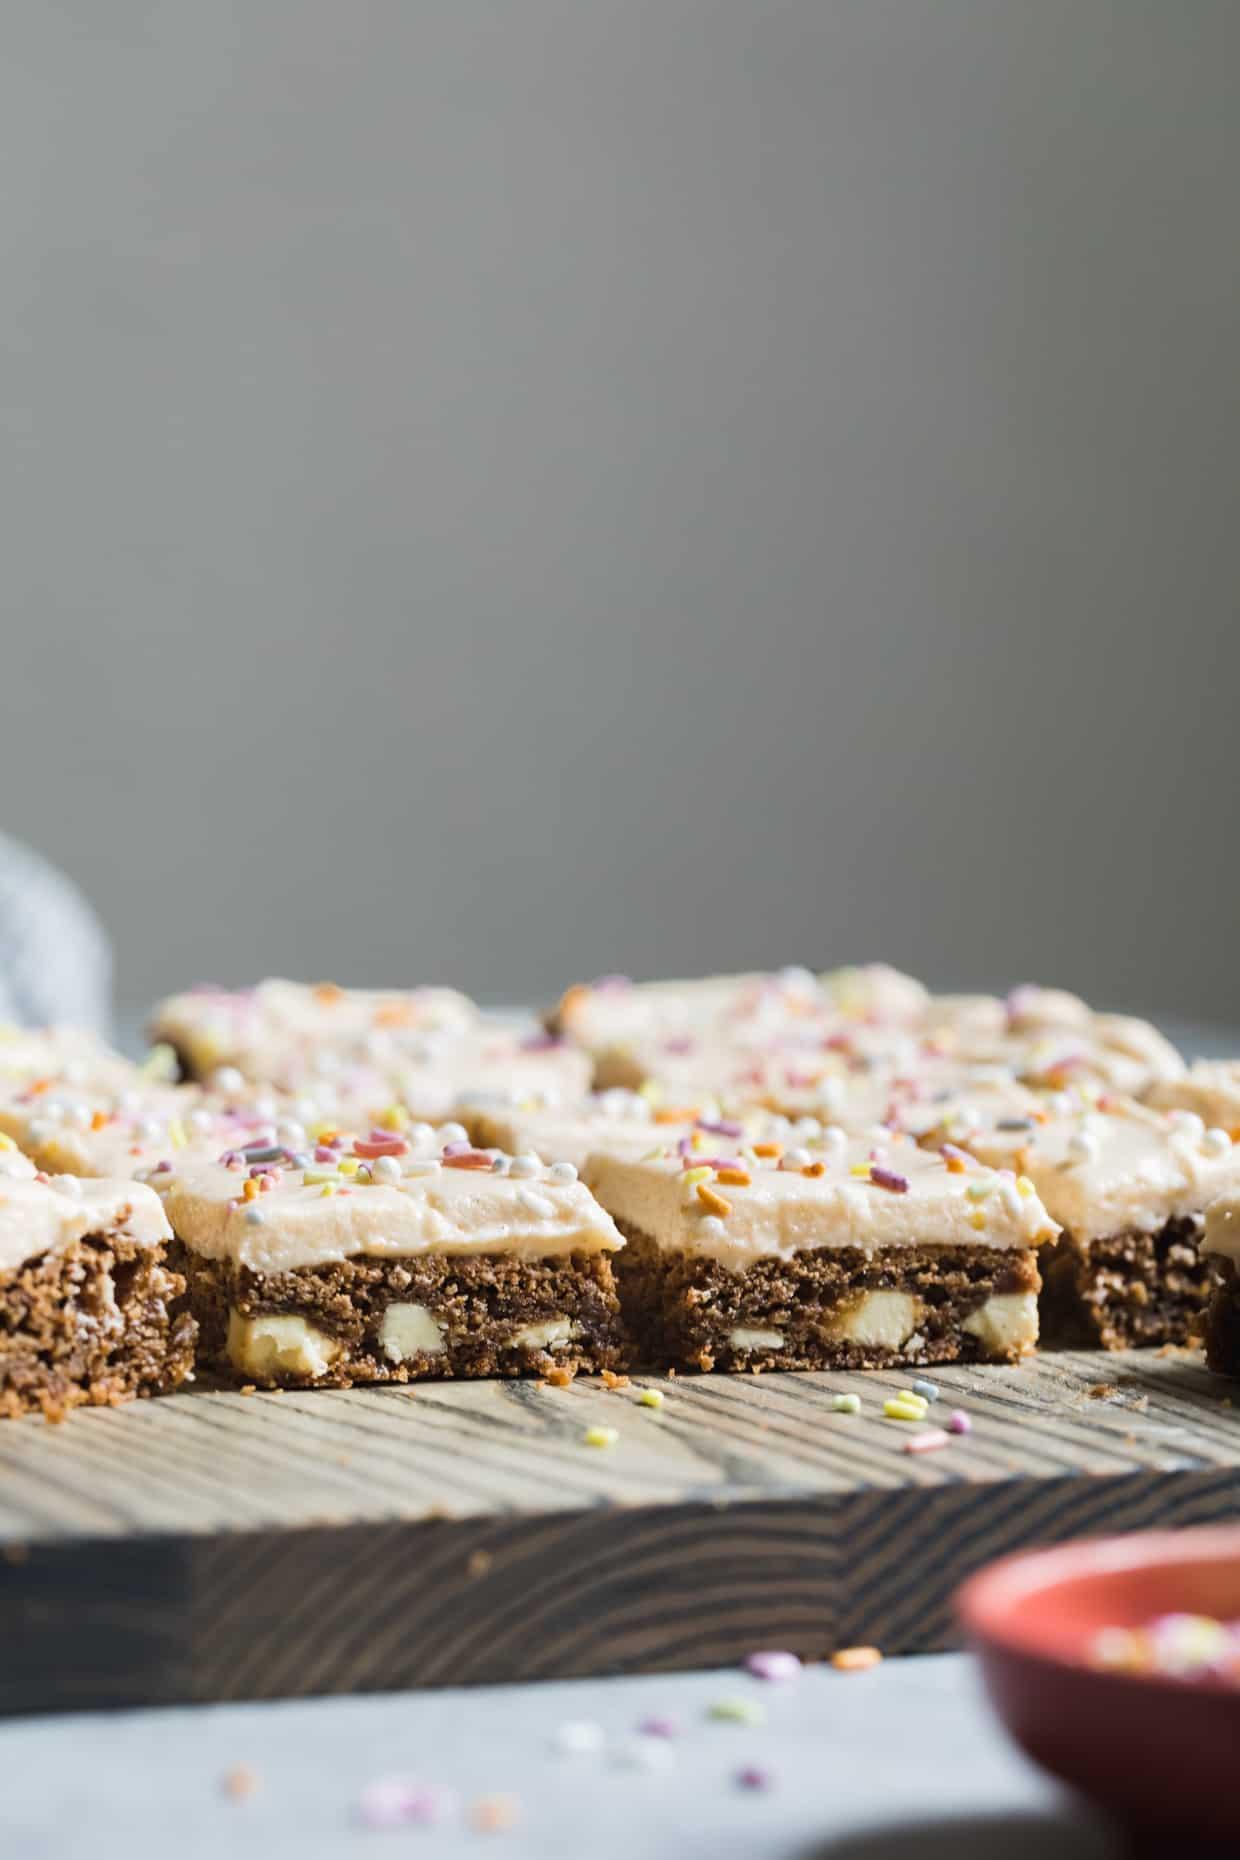 White Chocolate Cardamom Blondies with Grapefruit Frosting (gluten-free)